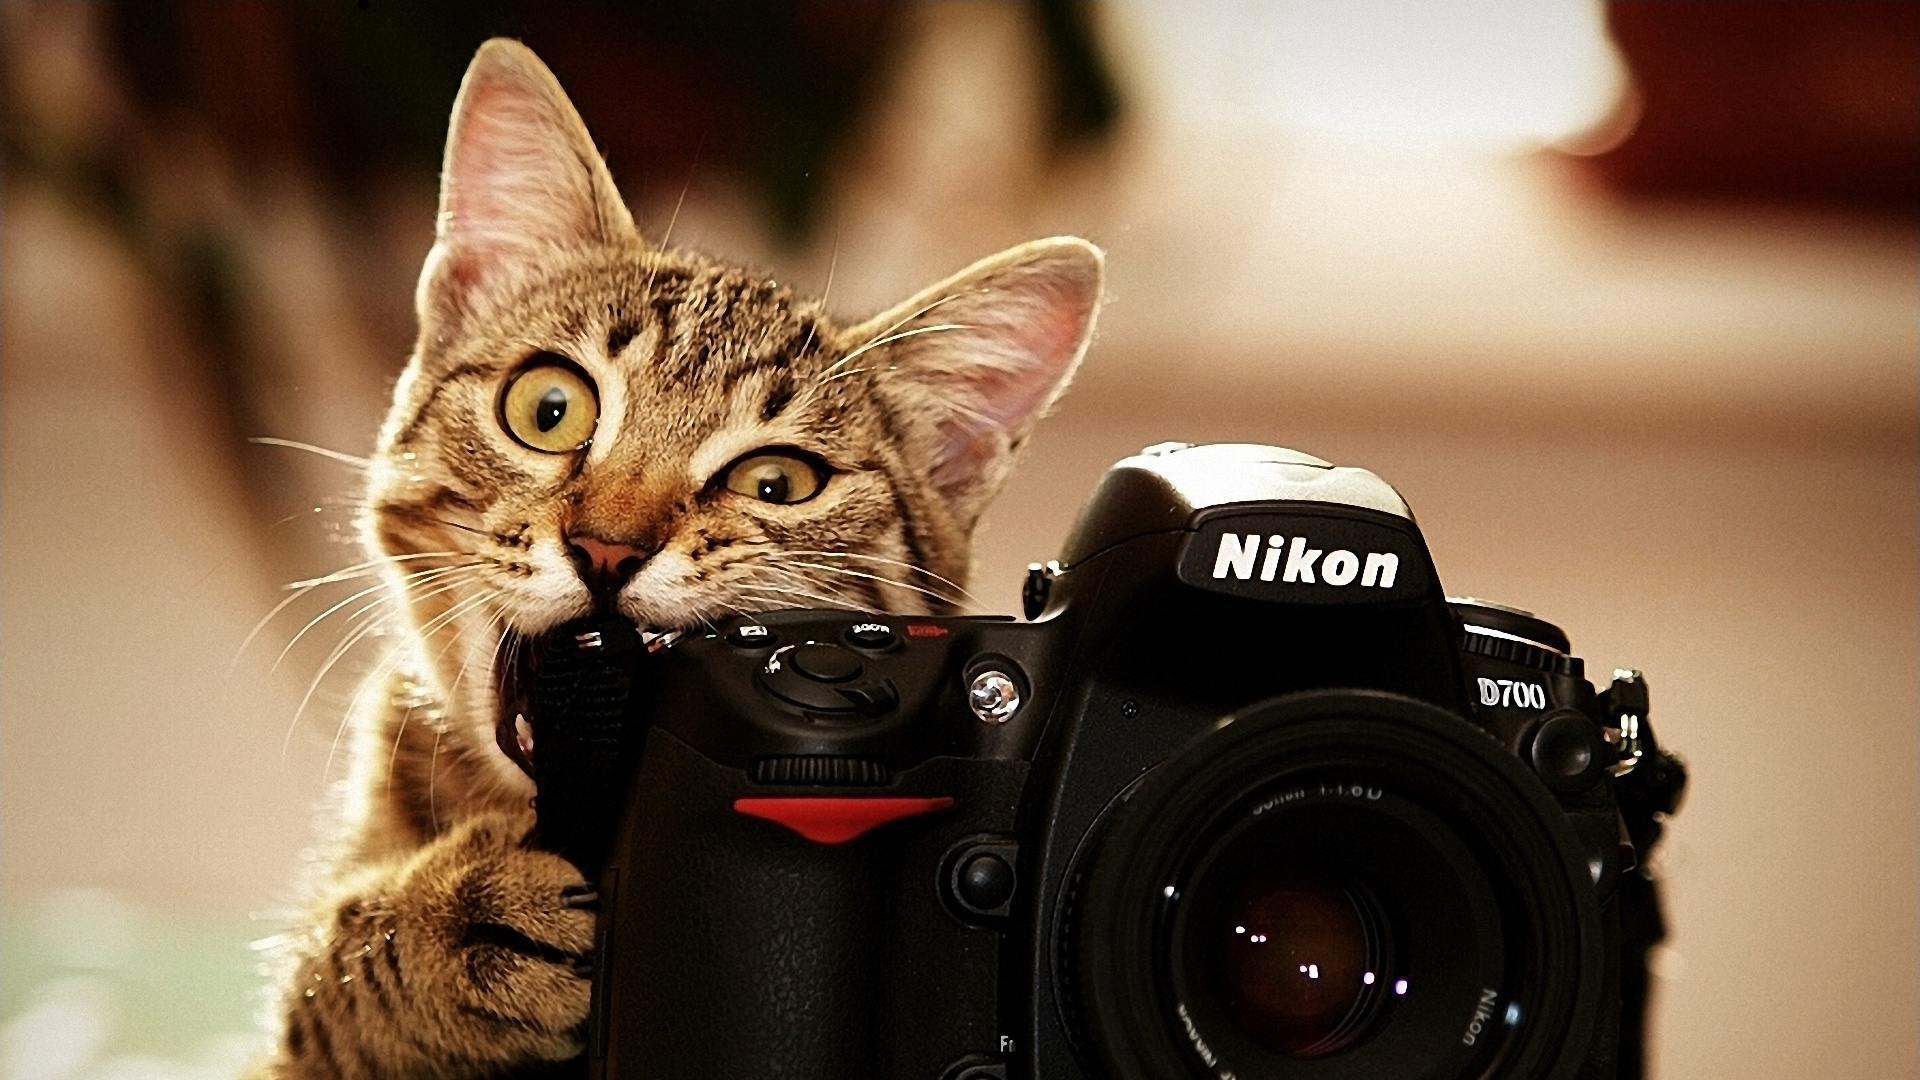 Cat computer background